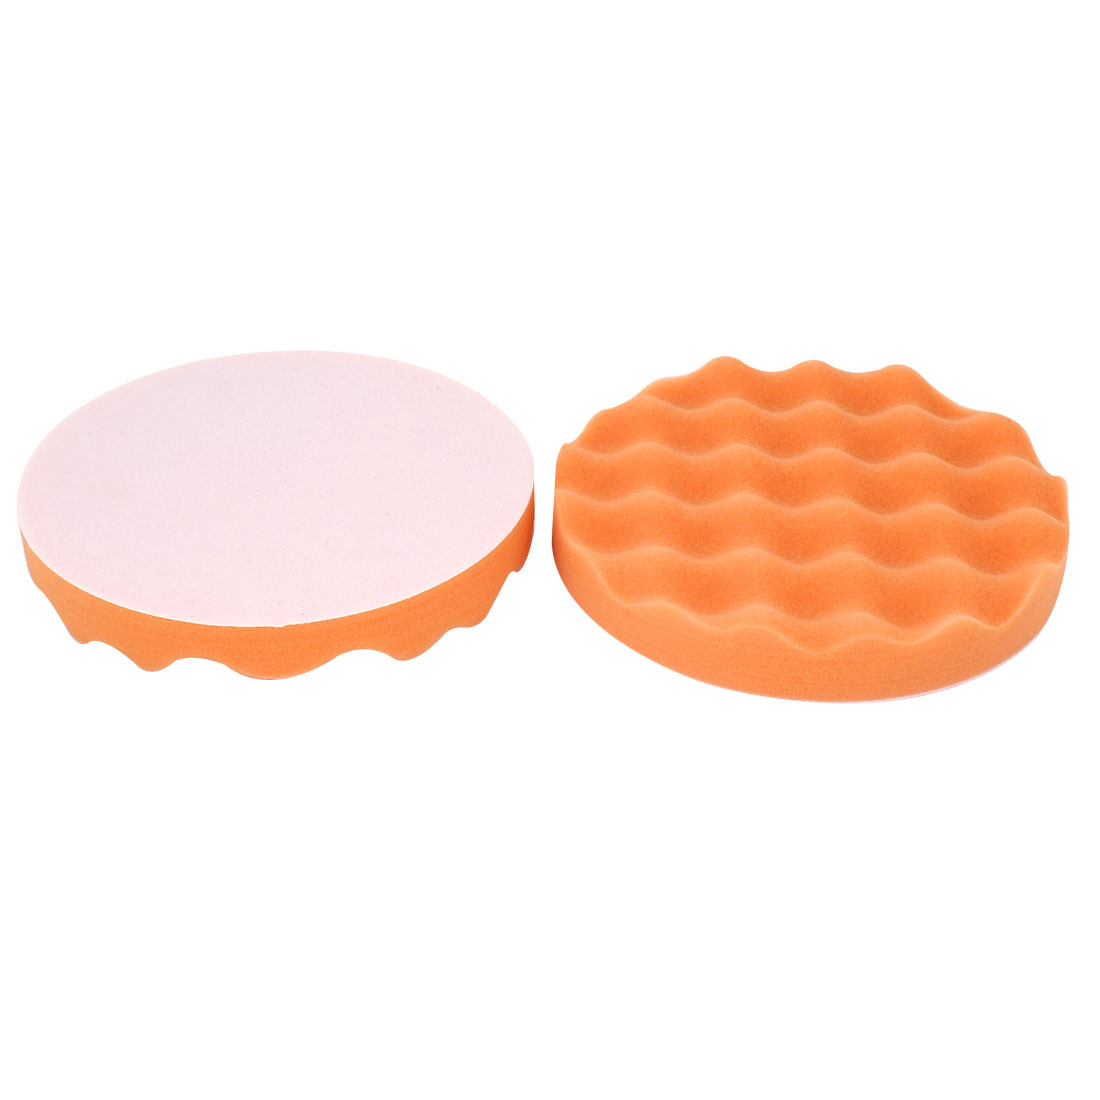 "Car 2pcs Wave Design Polishing Sponge Cleaning Pads Orange 7"" Diameter - image 1 de 1"